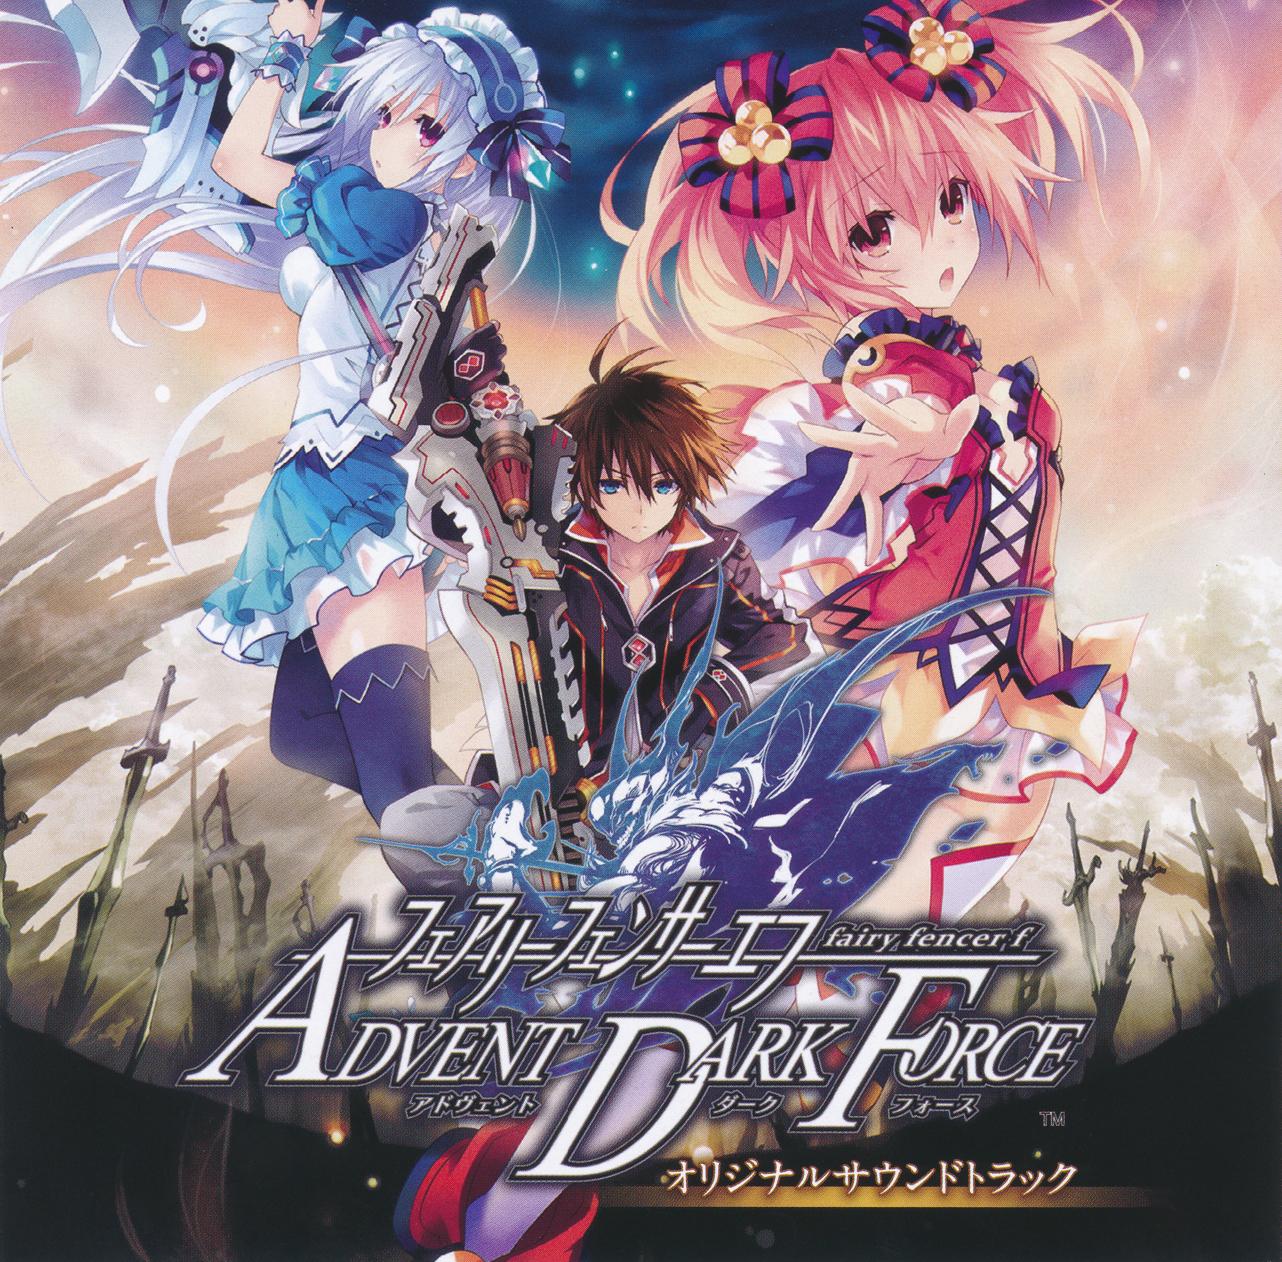 fairy fencer f ADVENT DARK FORCE Original Soundtrack and